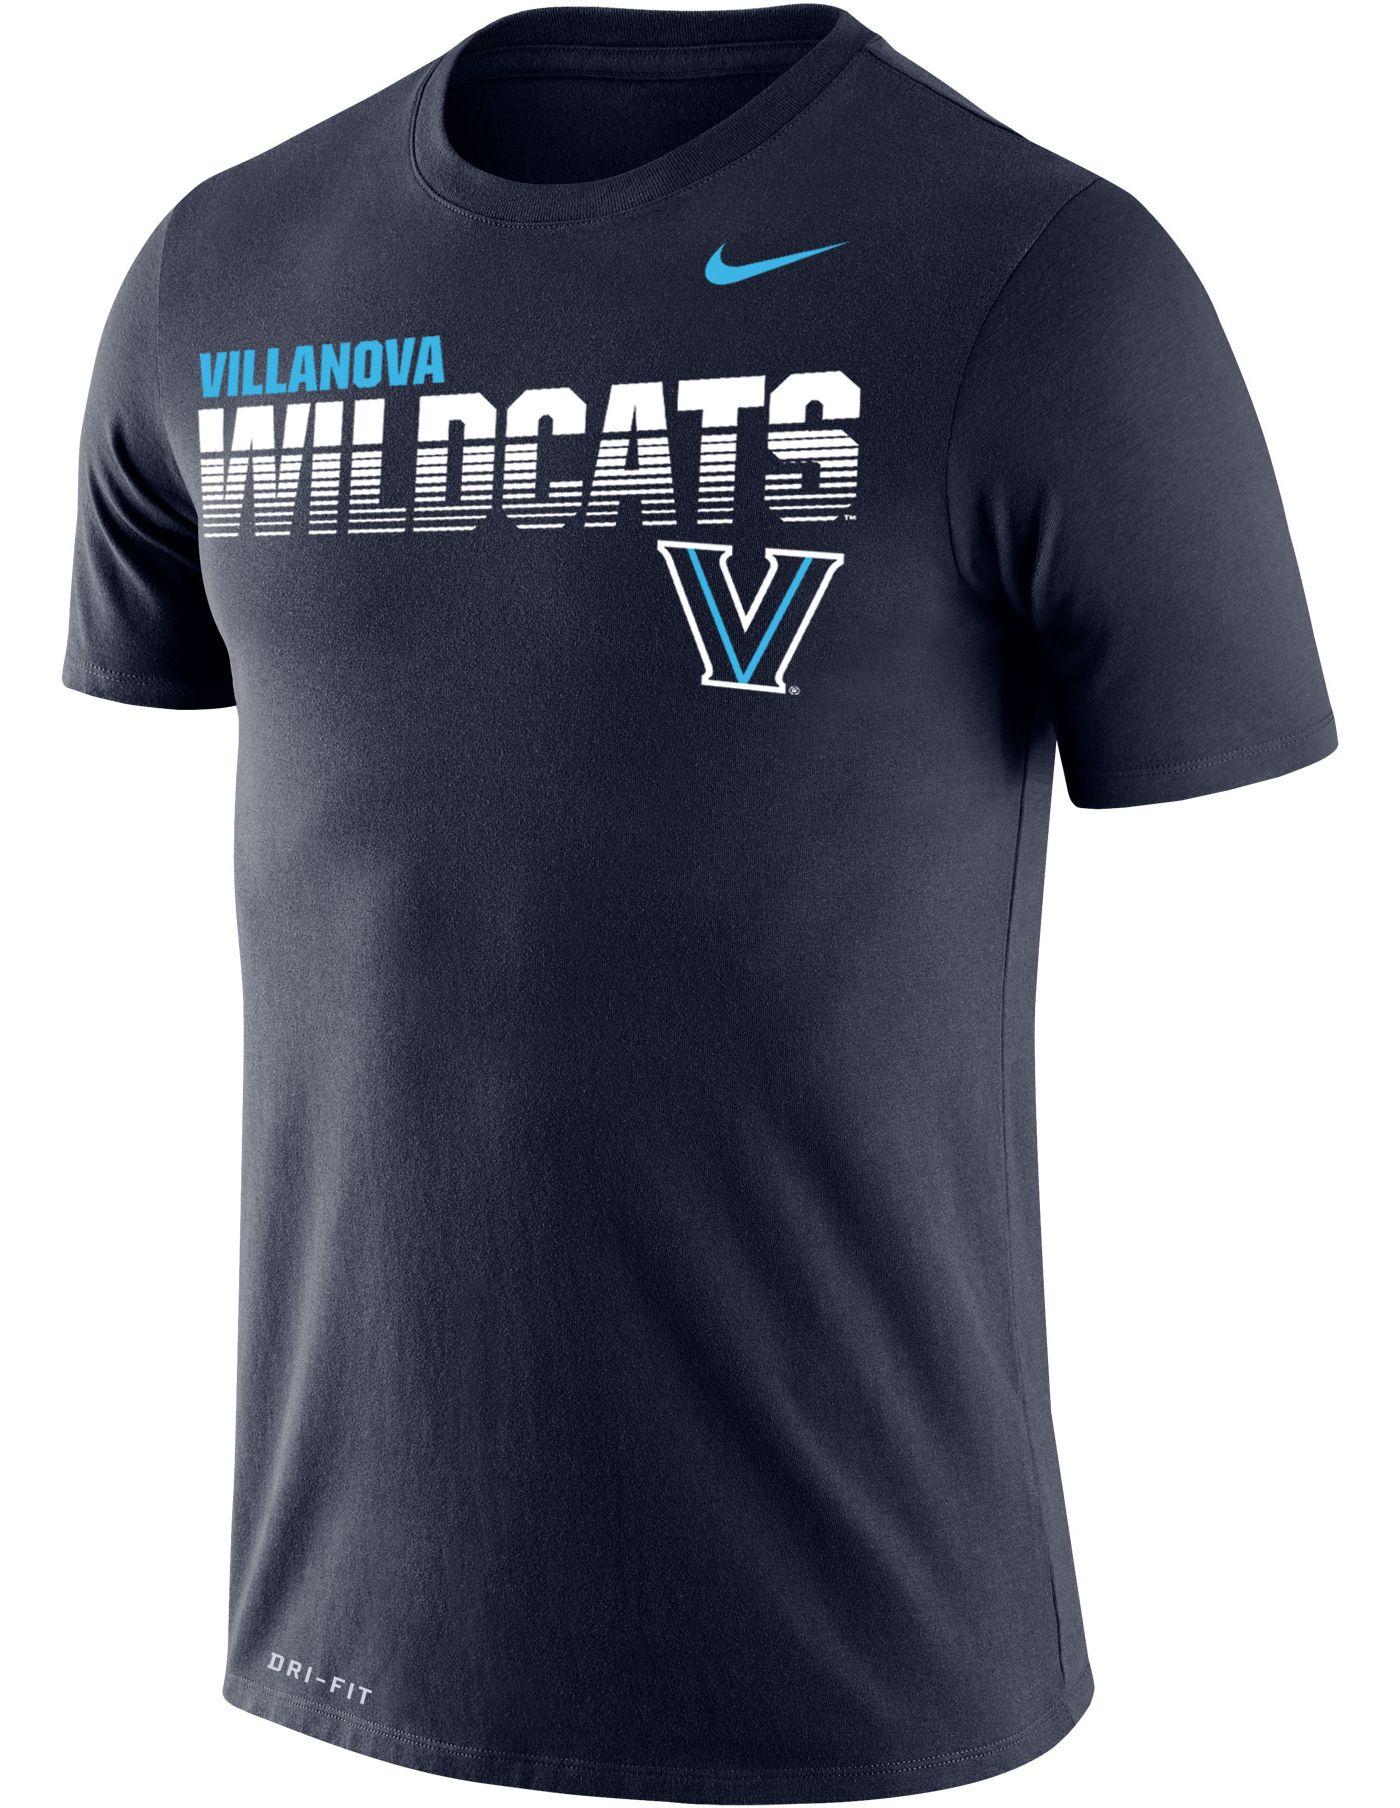 Nike Men's Villanova Wildcats Navy Legend Football Sideline T-Shirt